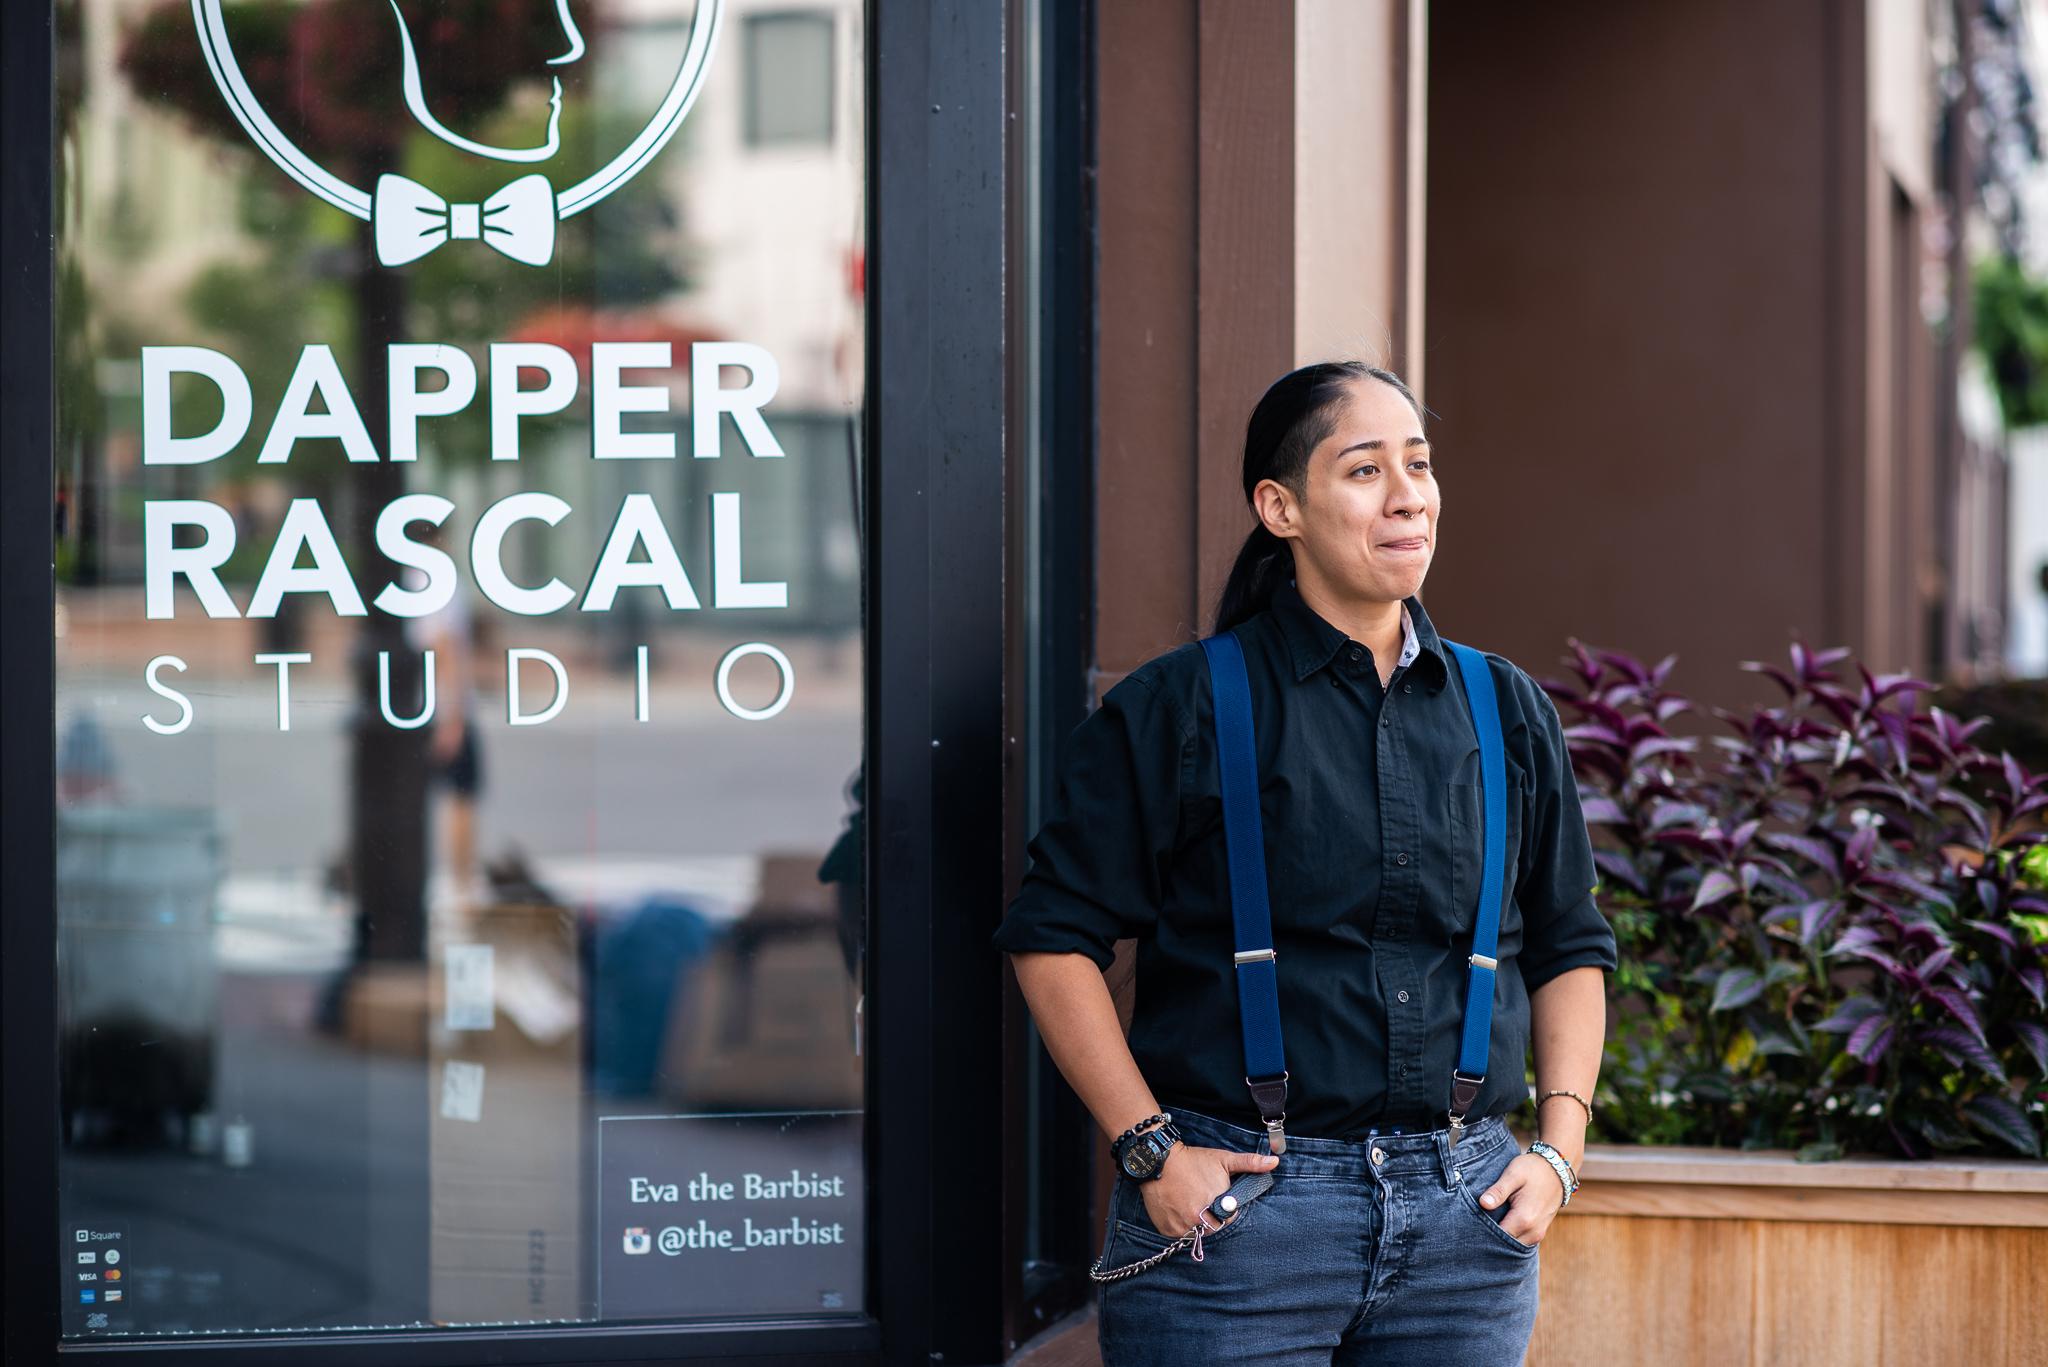 About Us - Dapper Rascal Studio